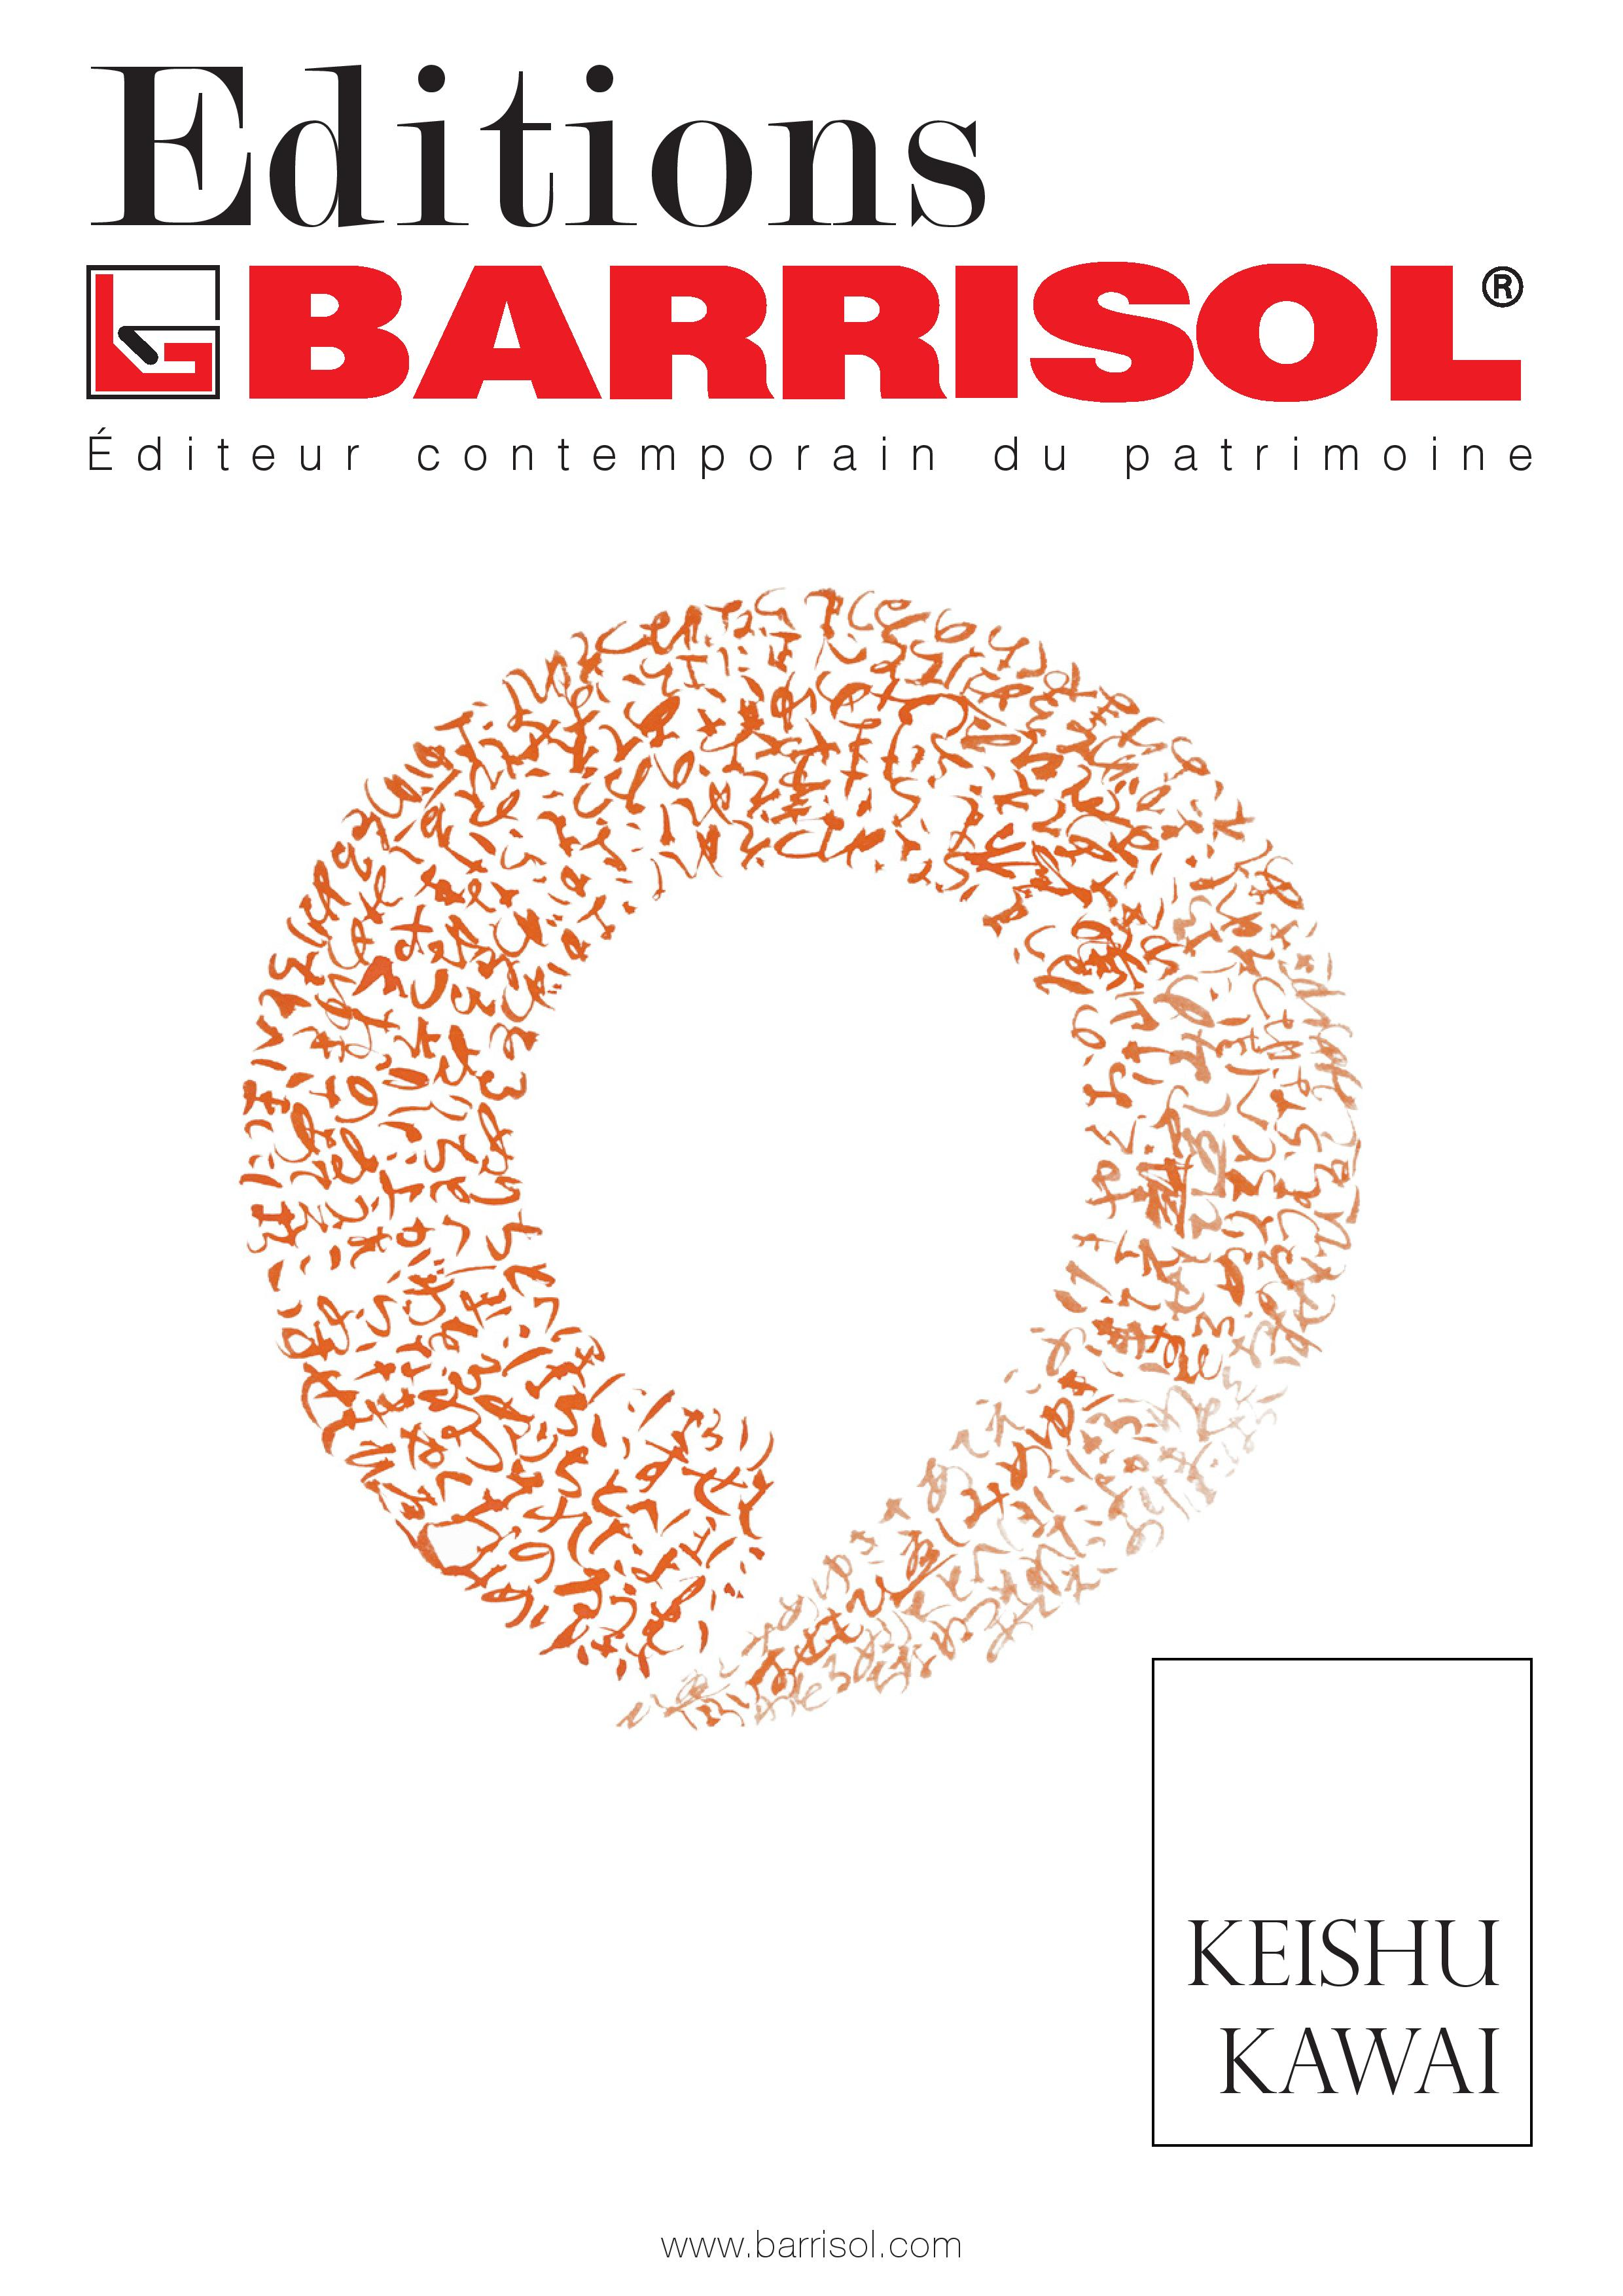 Editions BARRISOL - Catalogue Keishu Kawai